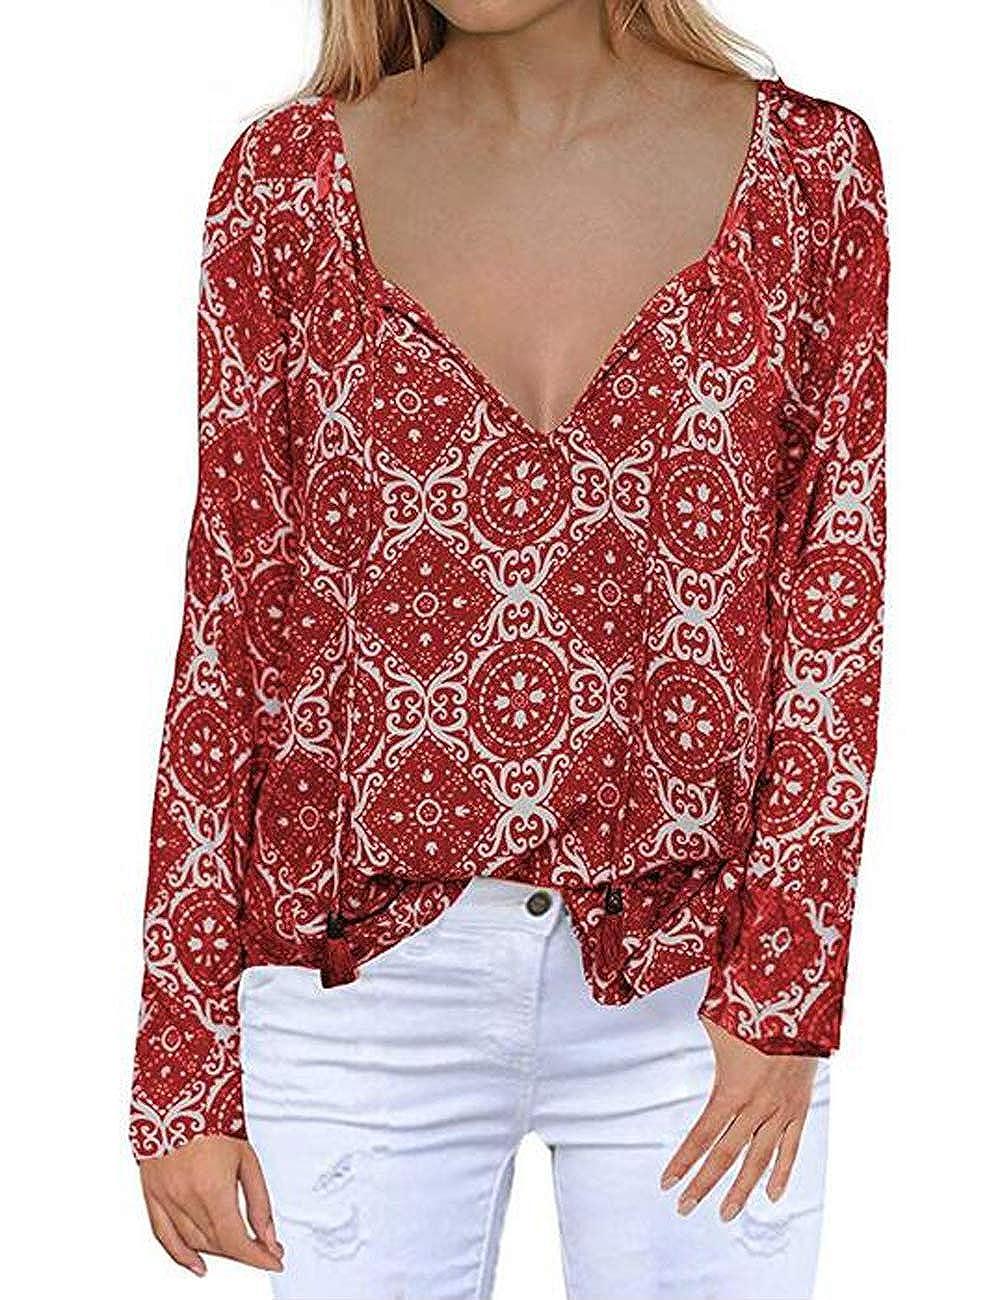 b620dc6b8fa Womens Long Sleeve Chiffon Blouse V Neck Floral Print Loose Fit Shirt Tops  at Amazon Women's Clothing store: